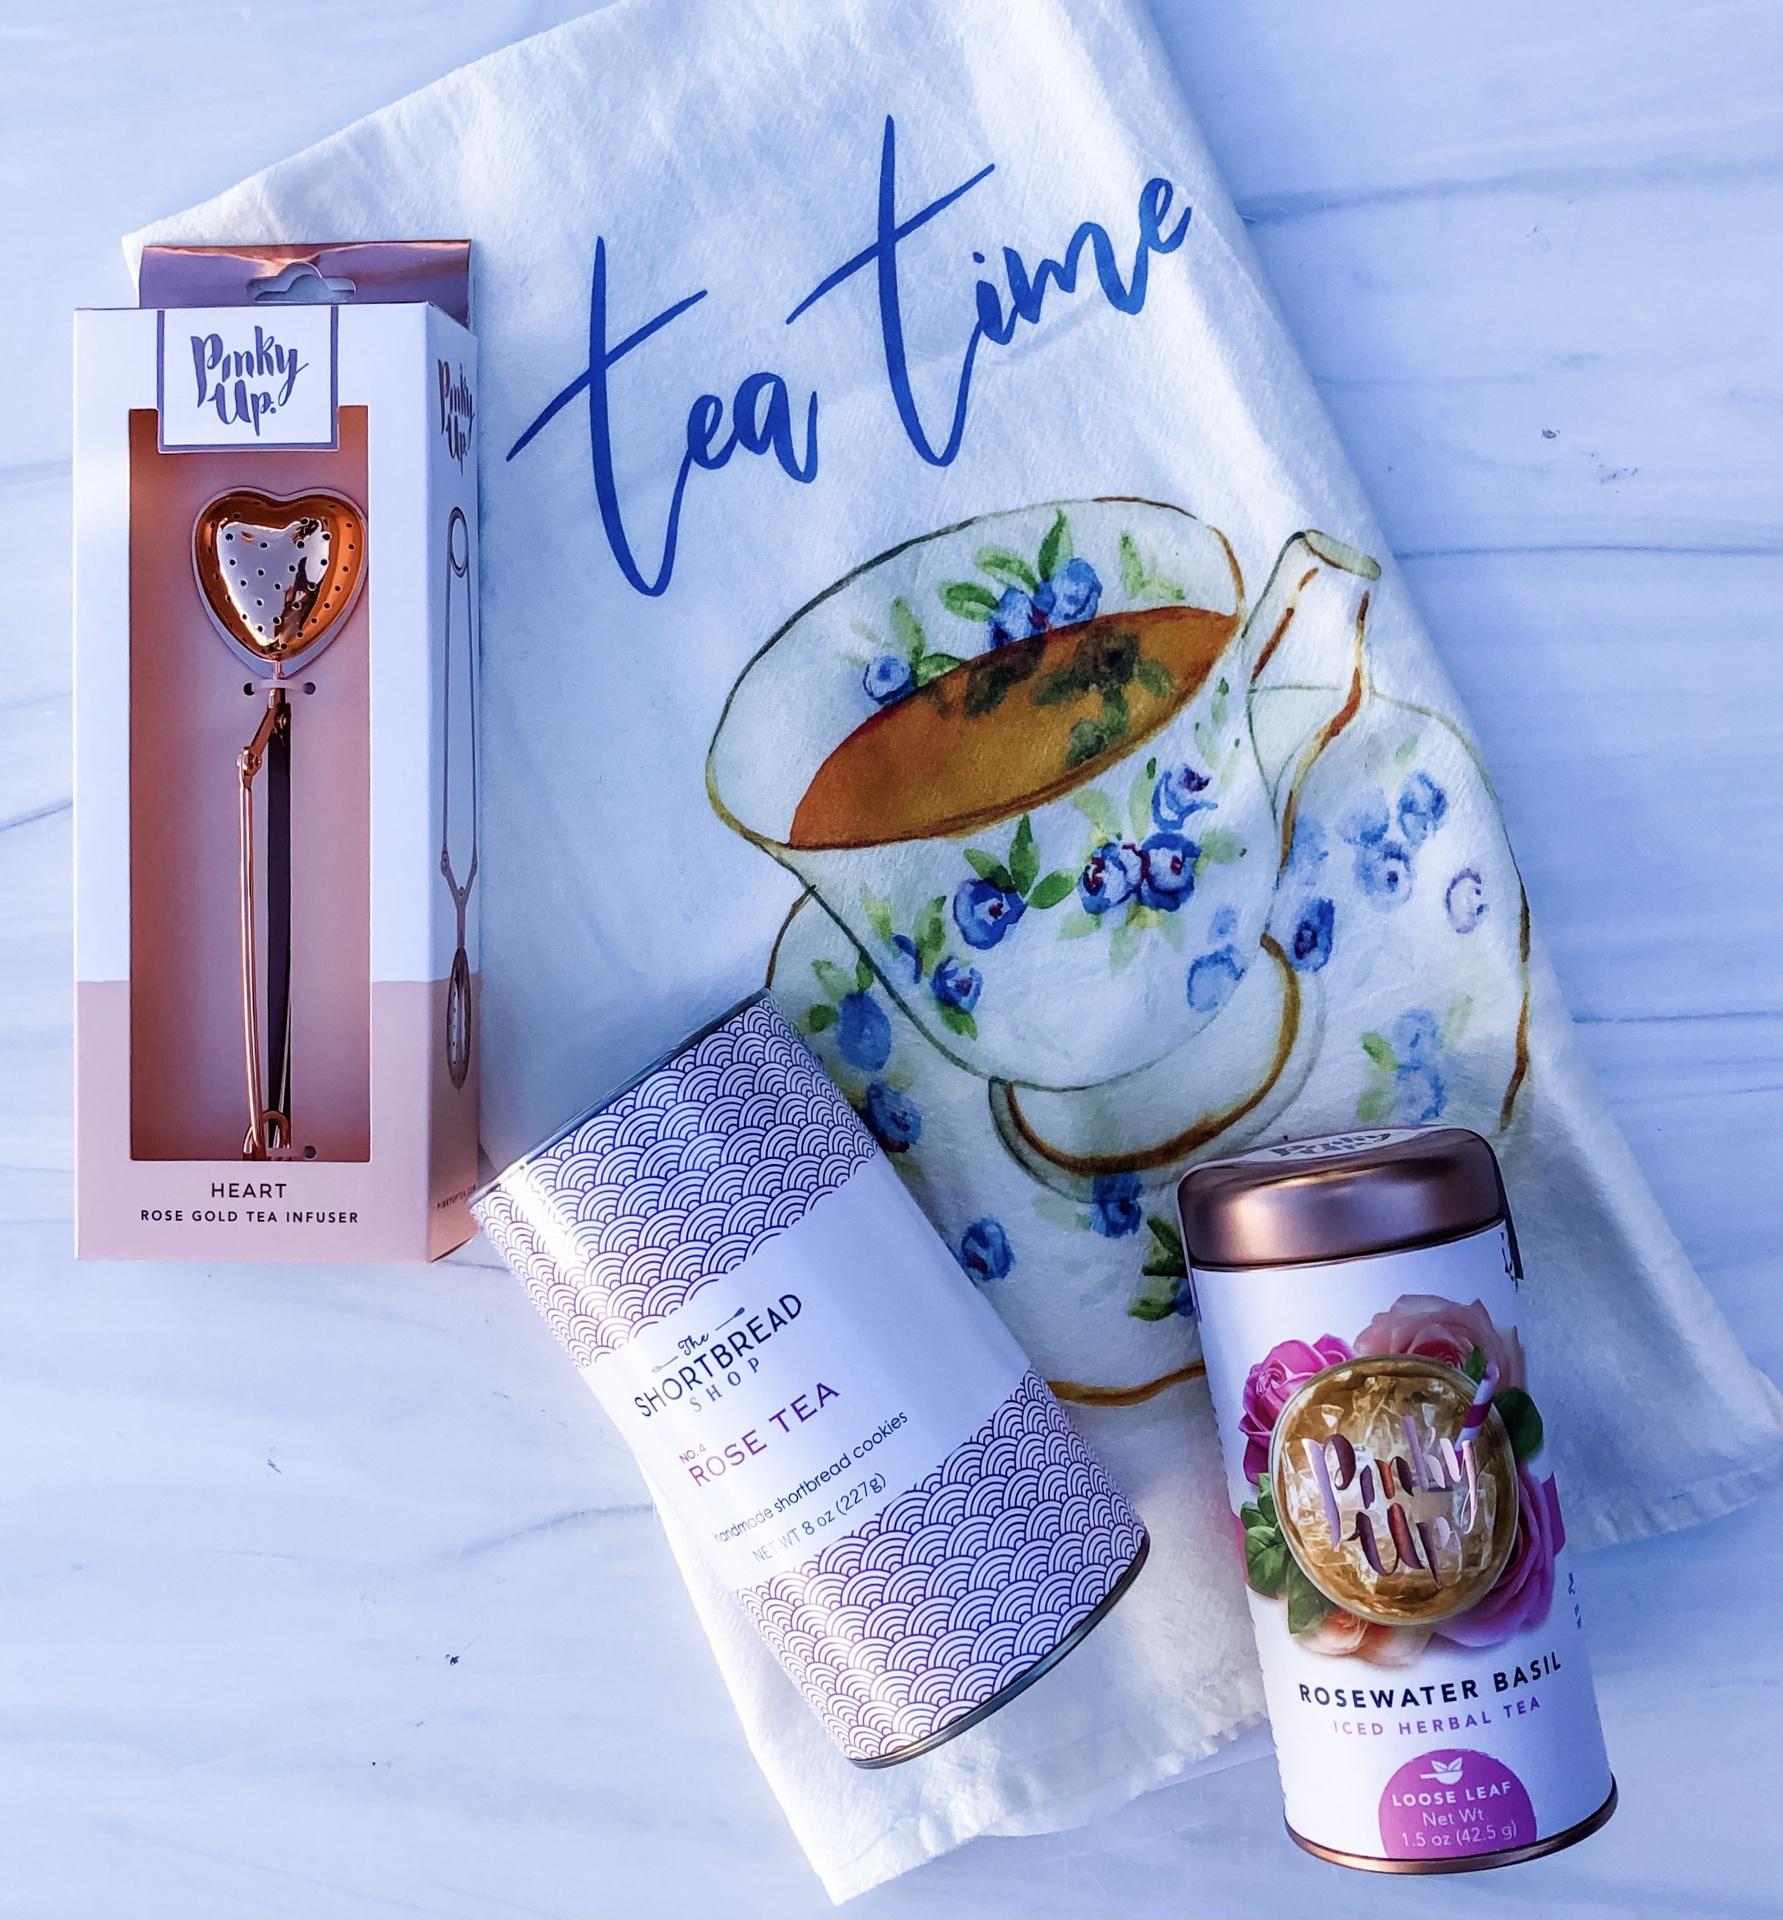 Tea Time Gift Set: Tea Time Tea Towel + Rose Tea Shortbread + Rosewater Basil Iced Herbal Tea + Heart Rose Gold Tea Infuser